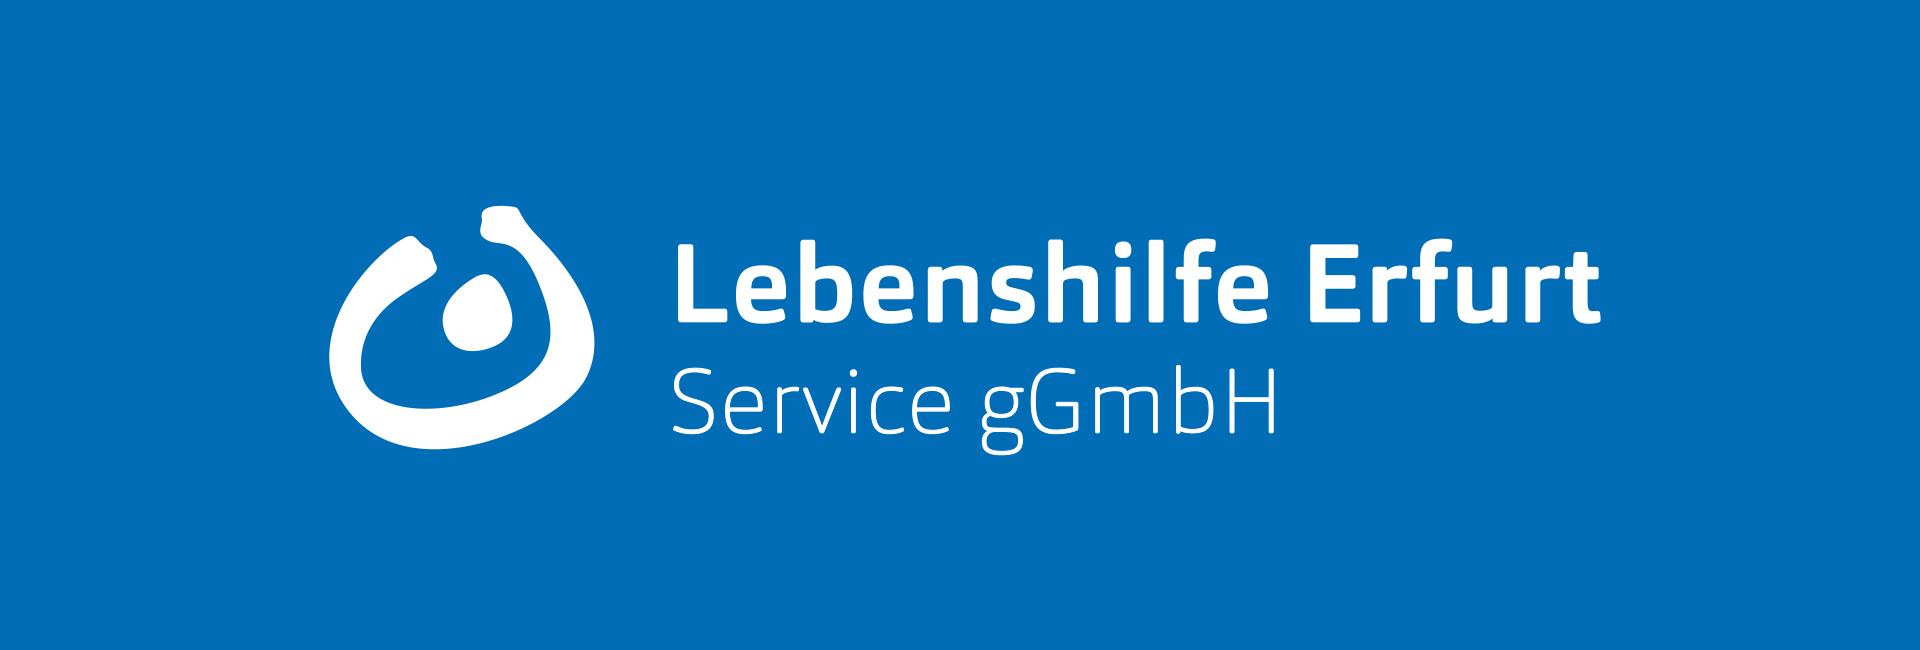 Das Logo der Lebenshilfe Erfurt Service gGmbH.